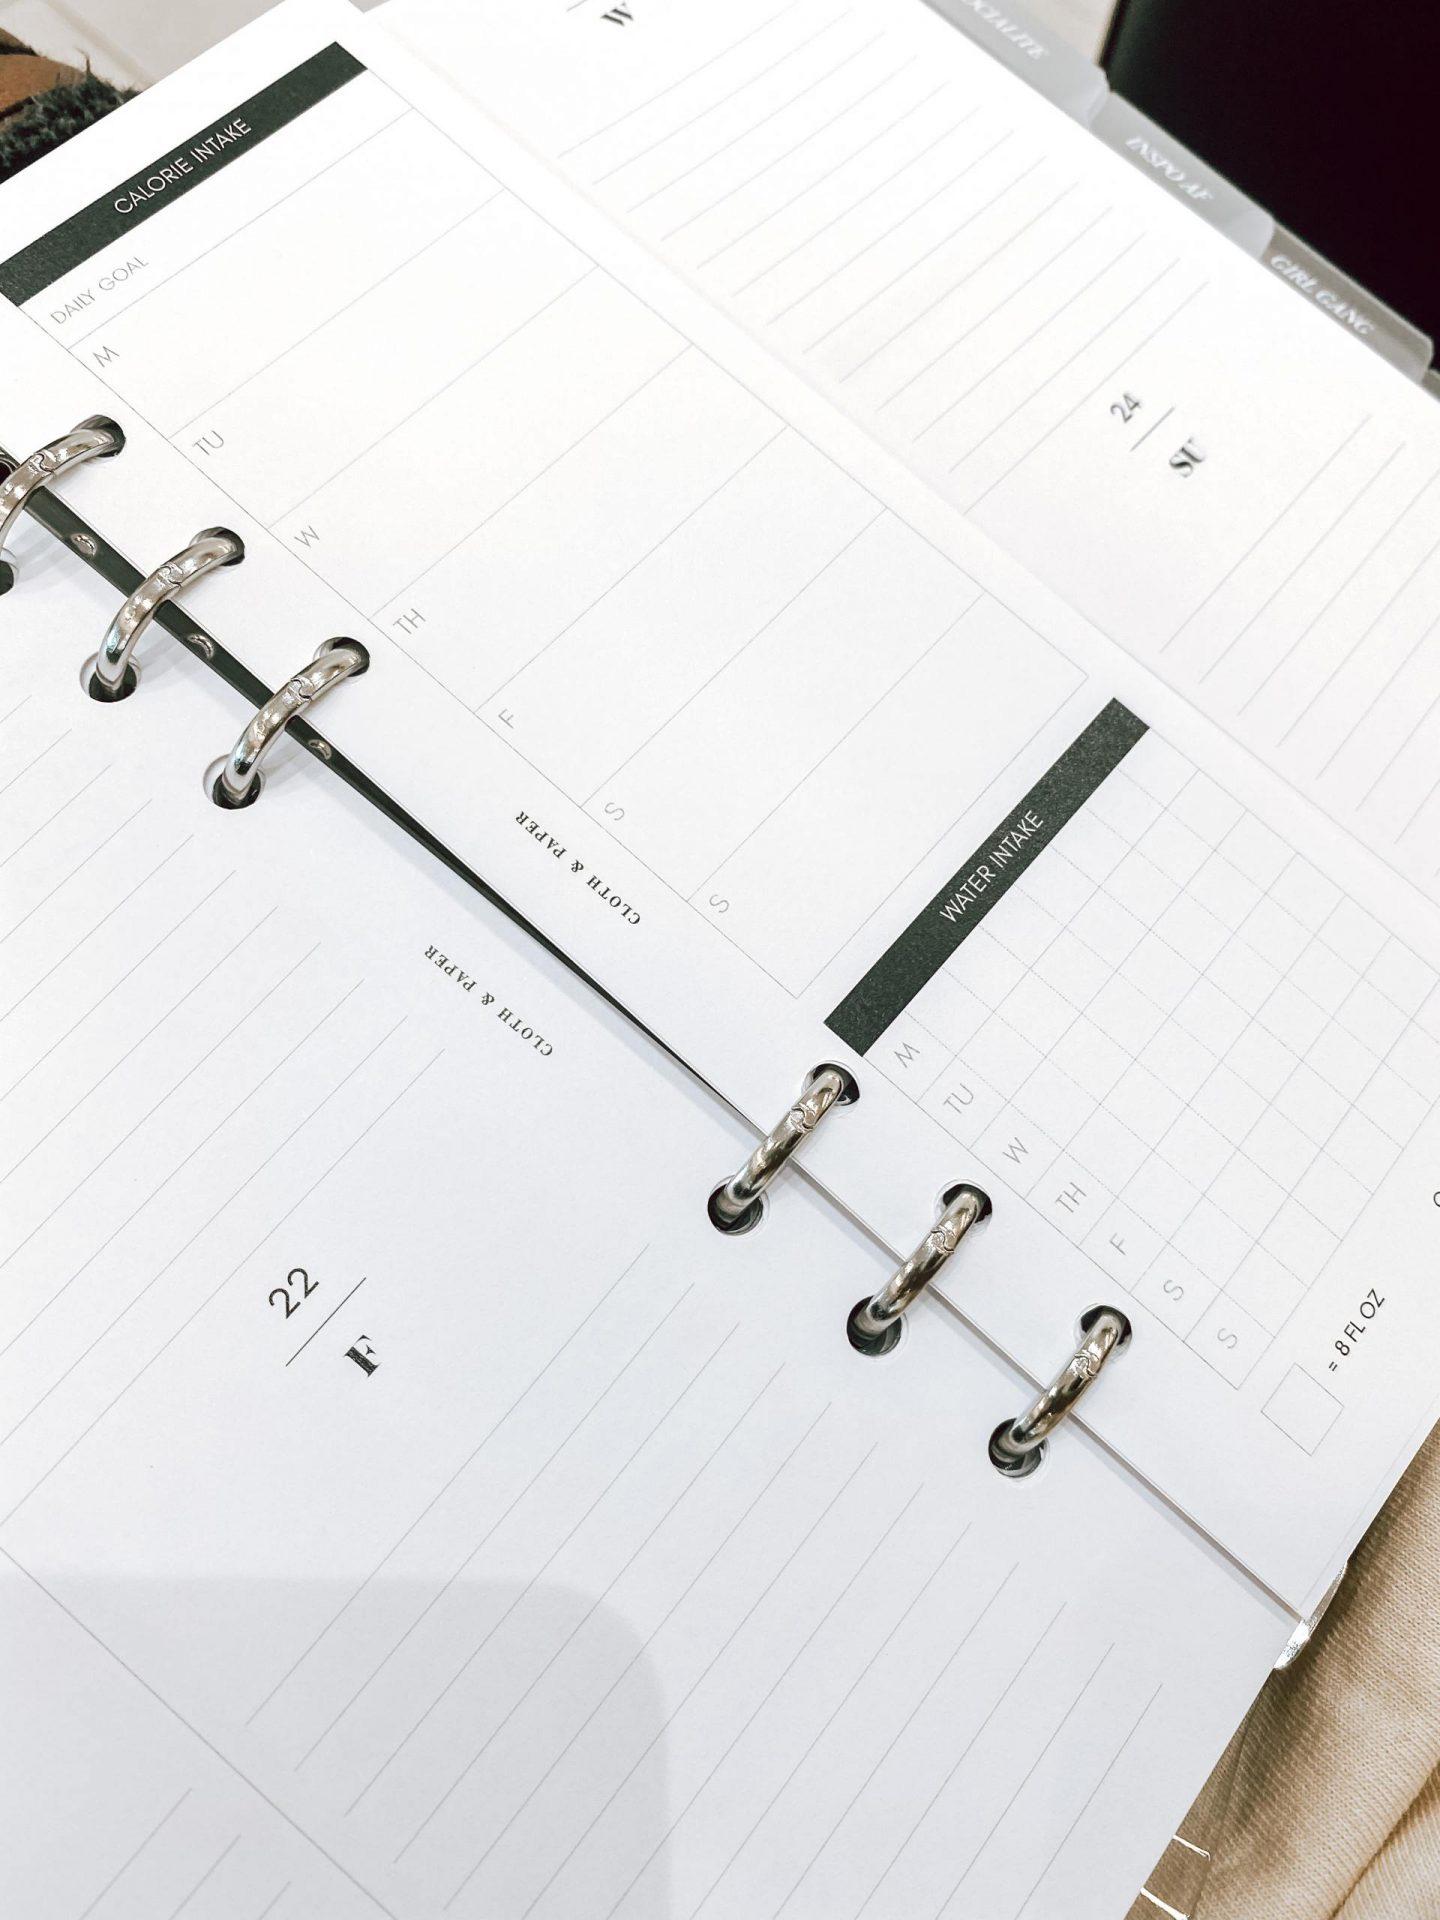 Beginners Guide to Custom Planners